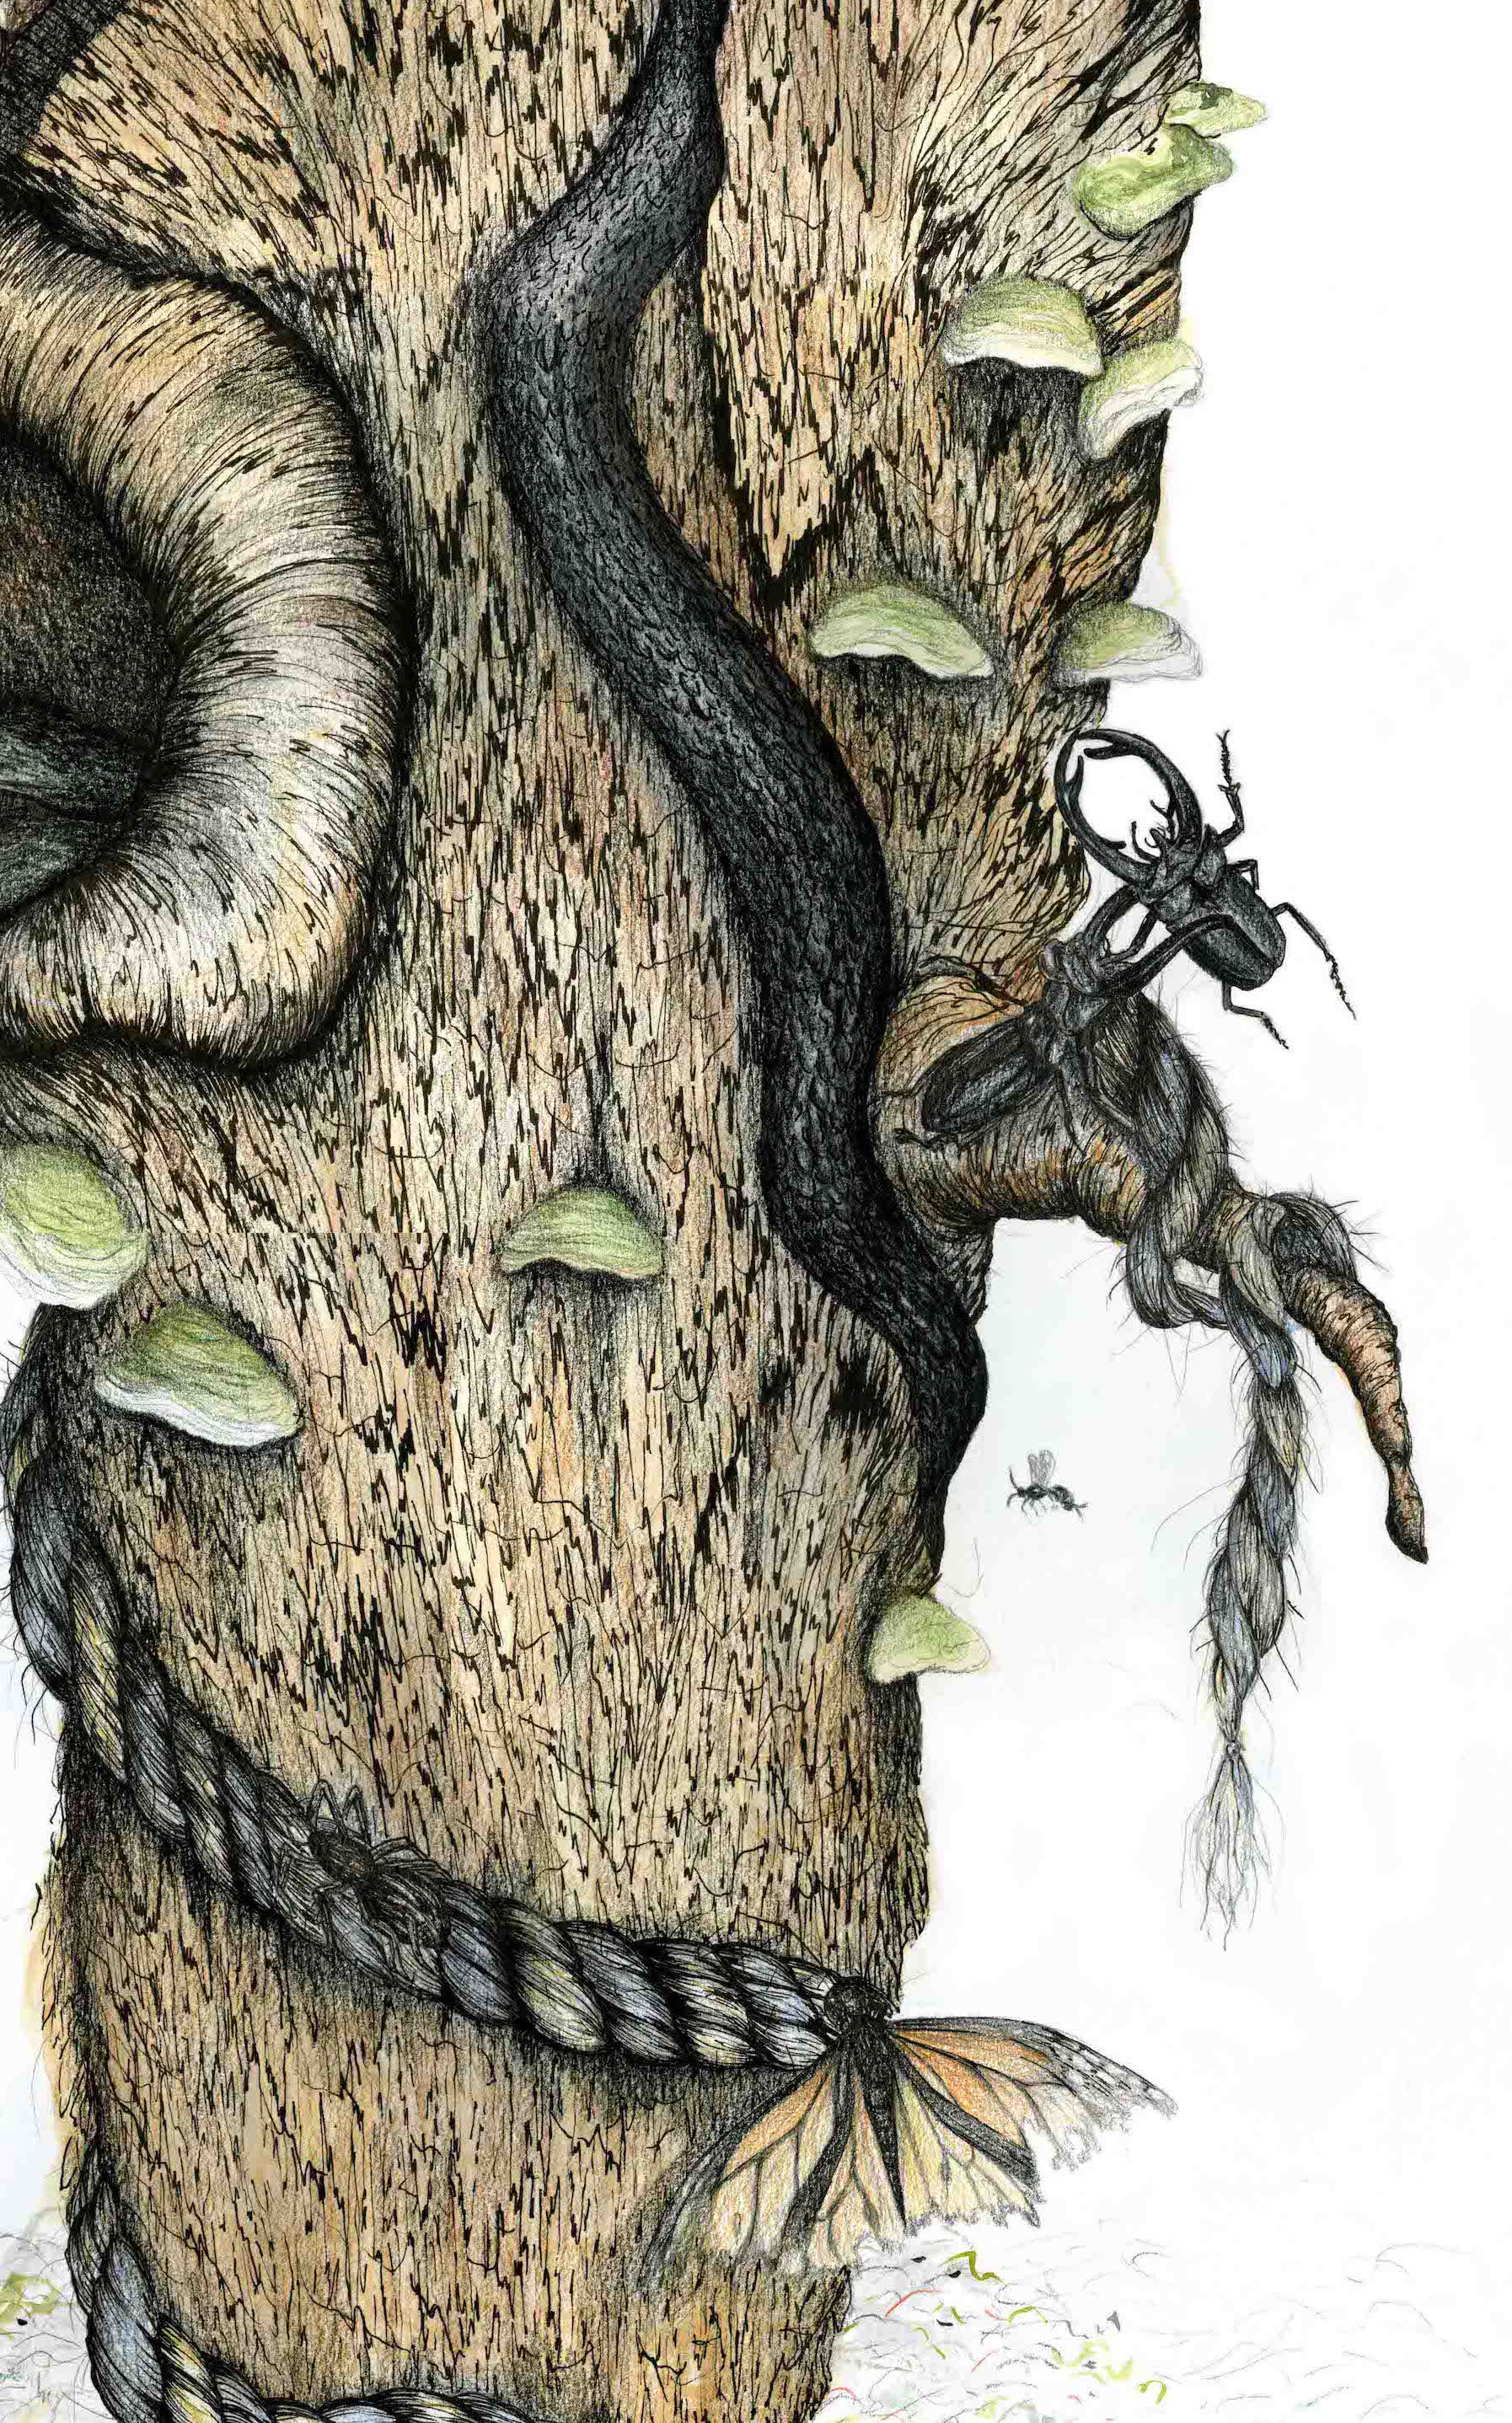 Balancing_Act_Crop_Beetles.jpg